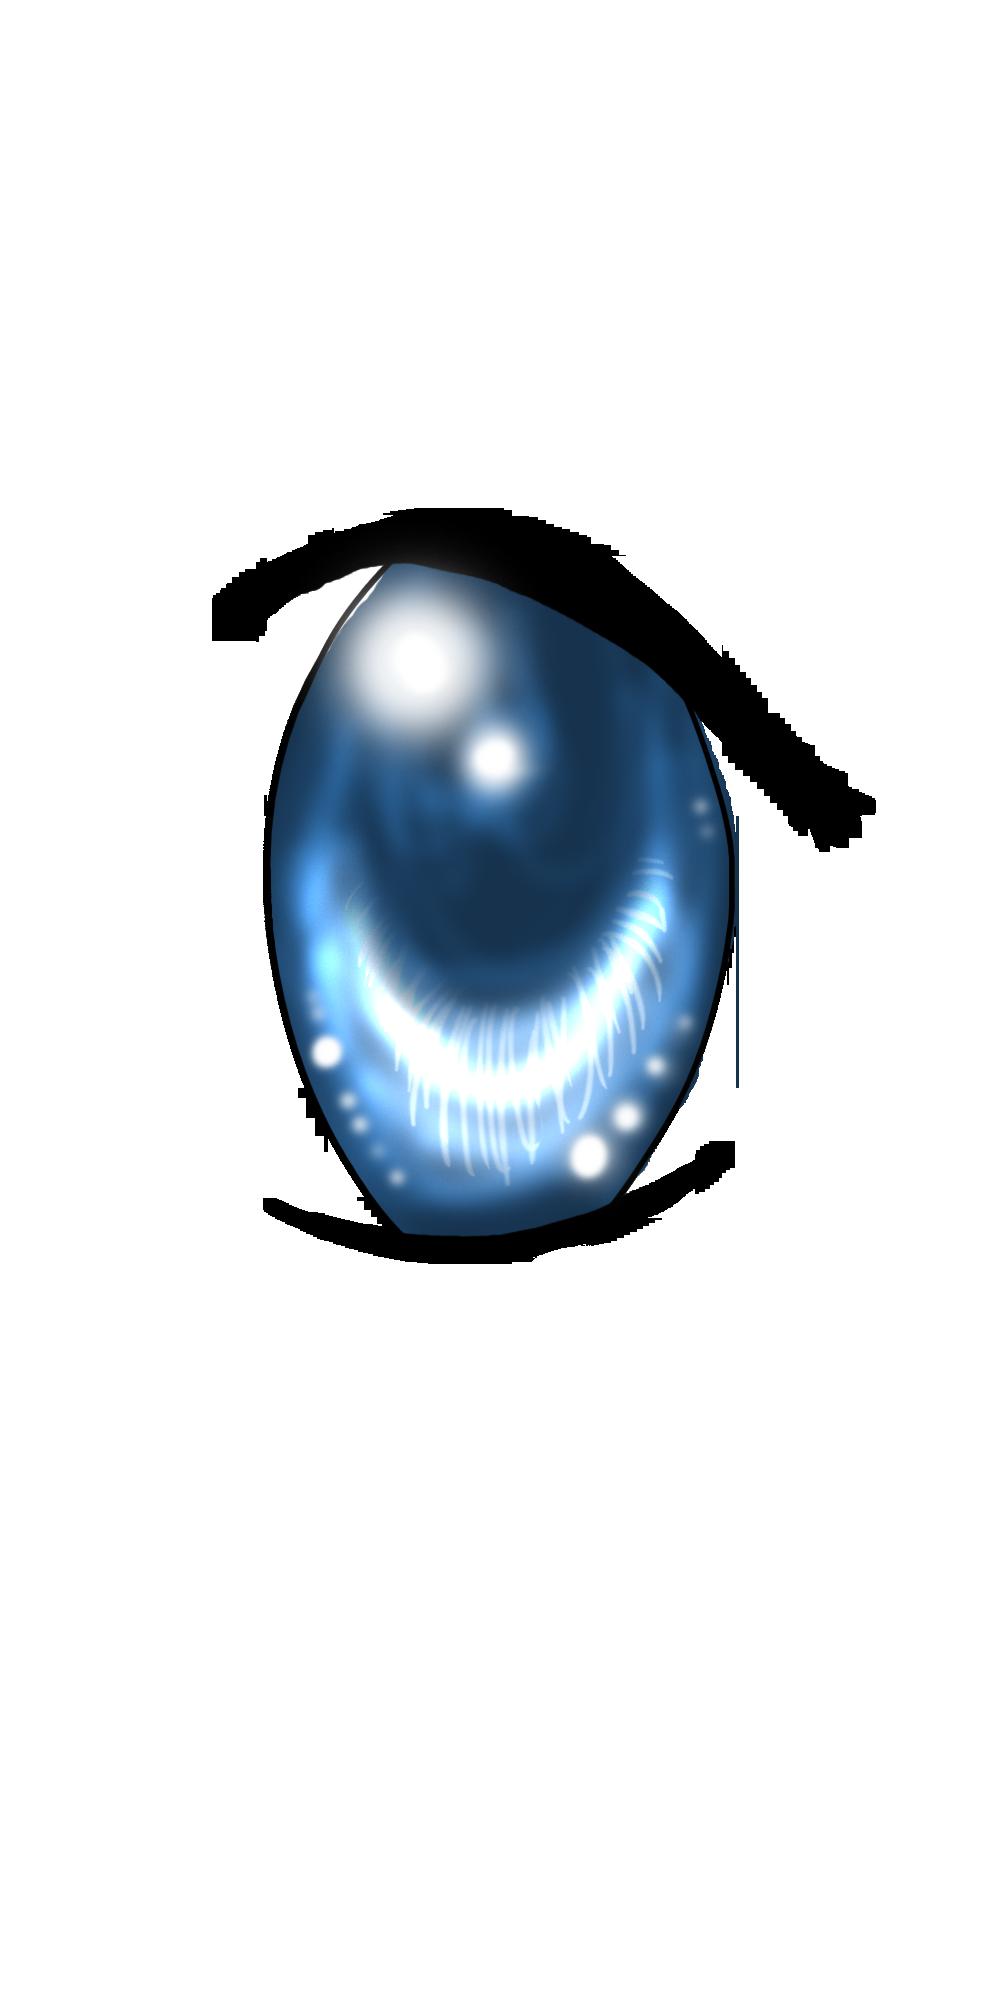 Blue Eyes clipart anime eye Tuari DeviantArt by x Anime